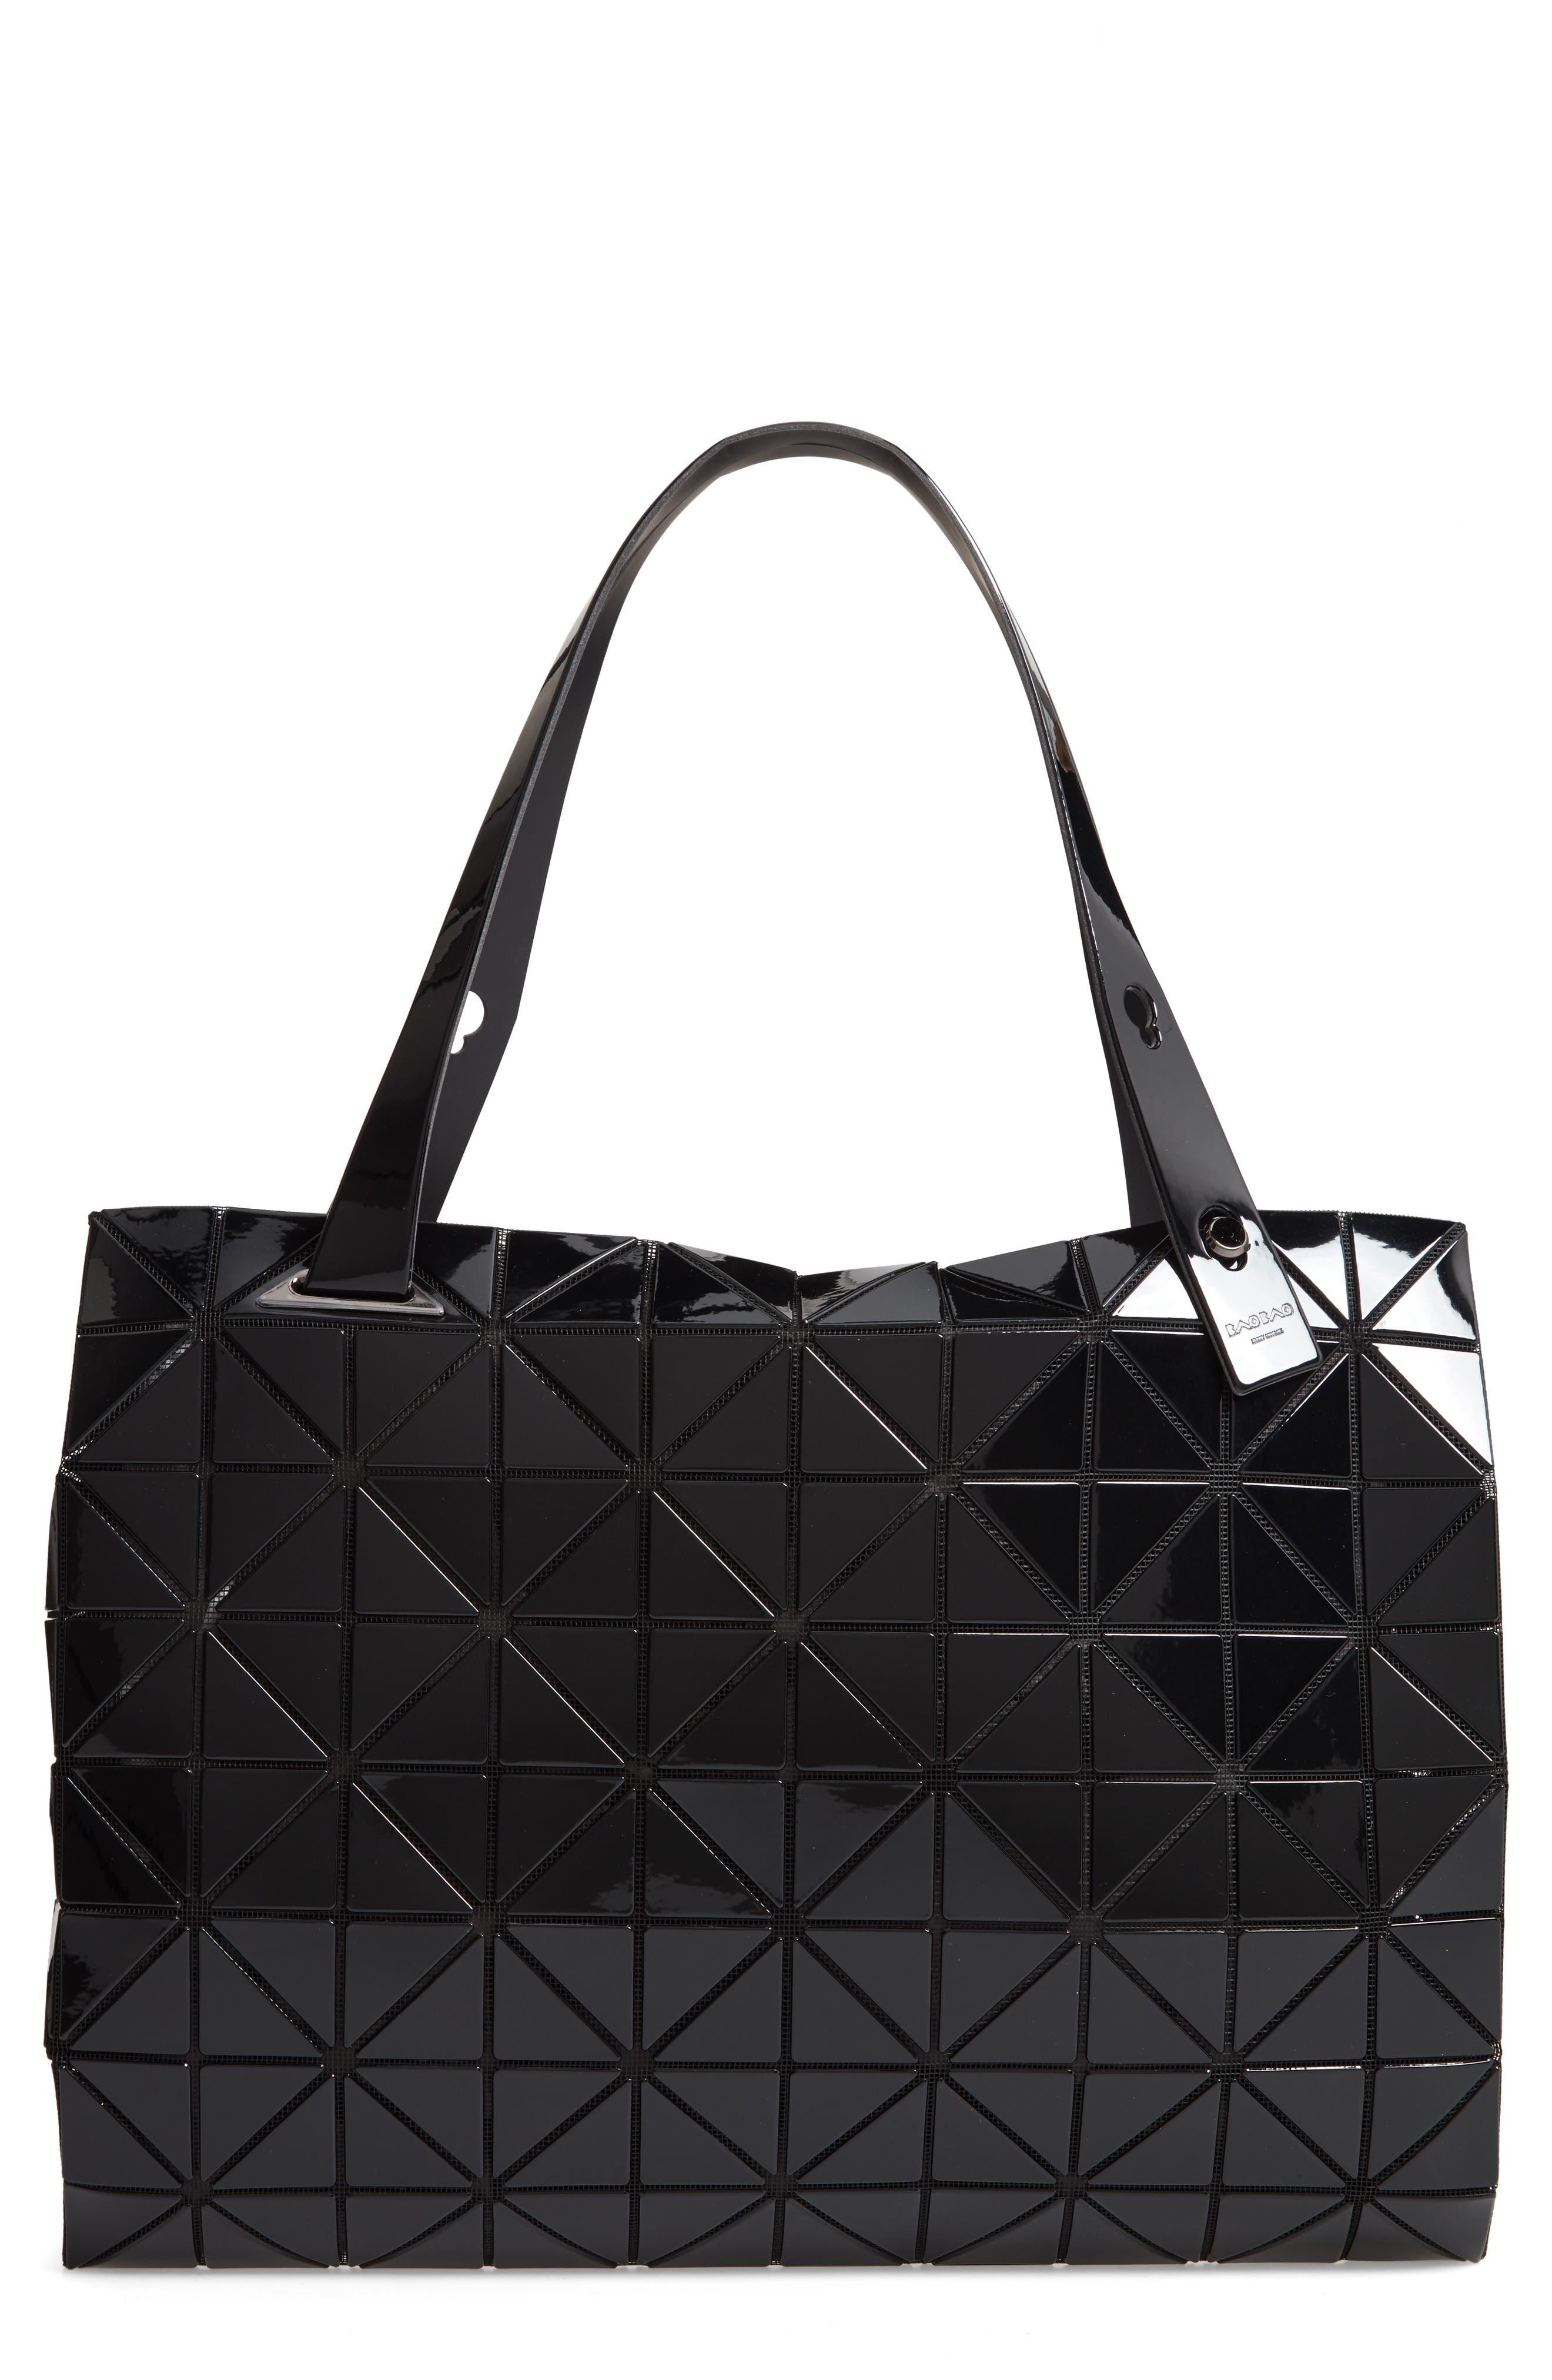 Carton Prism Tote Bag,                             Main thumbnail 1, color,                             BLACK